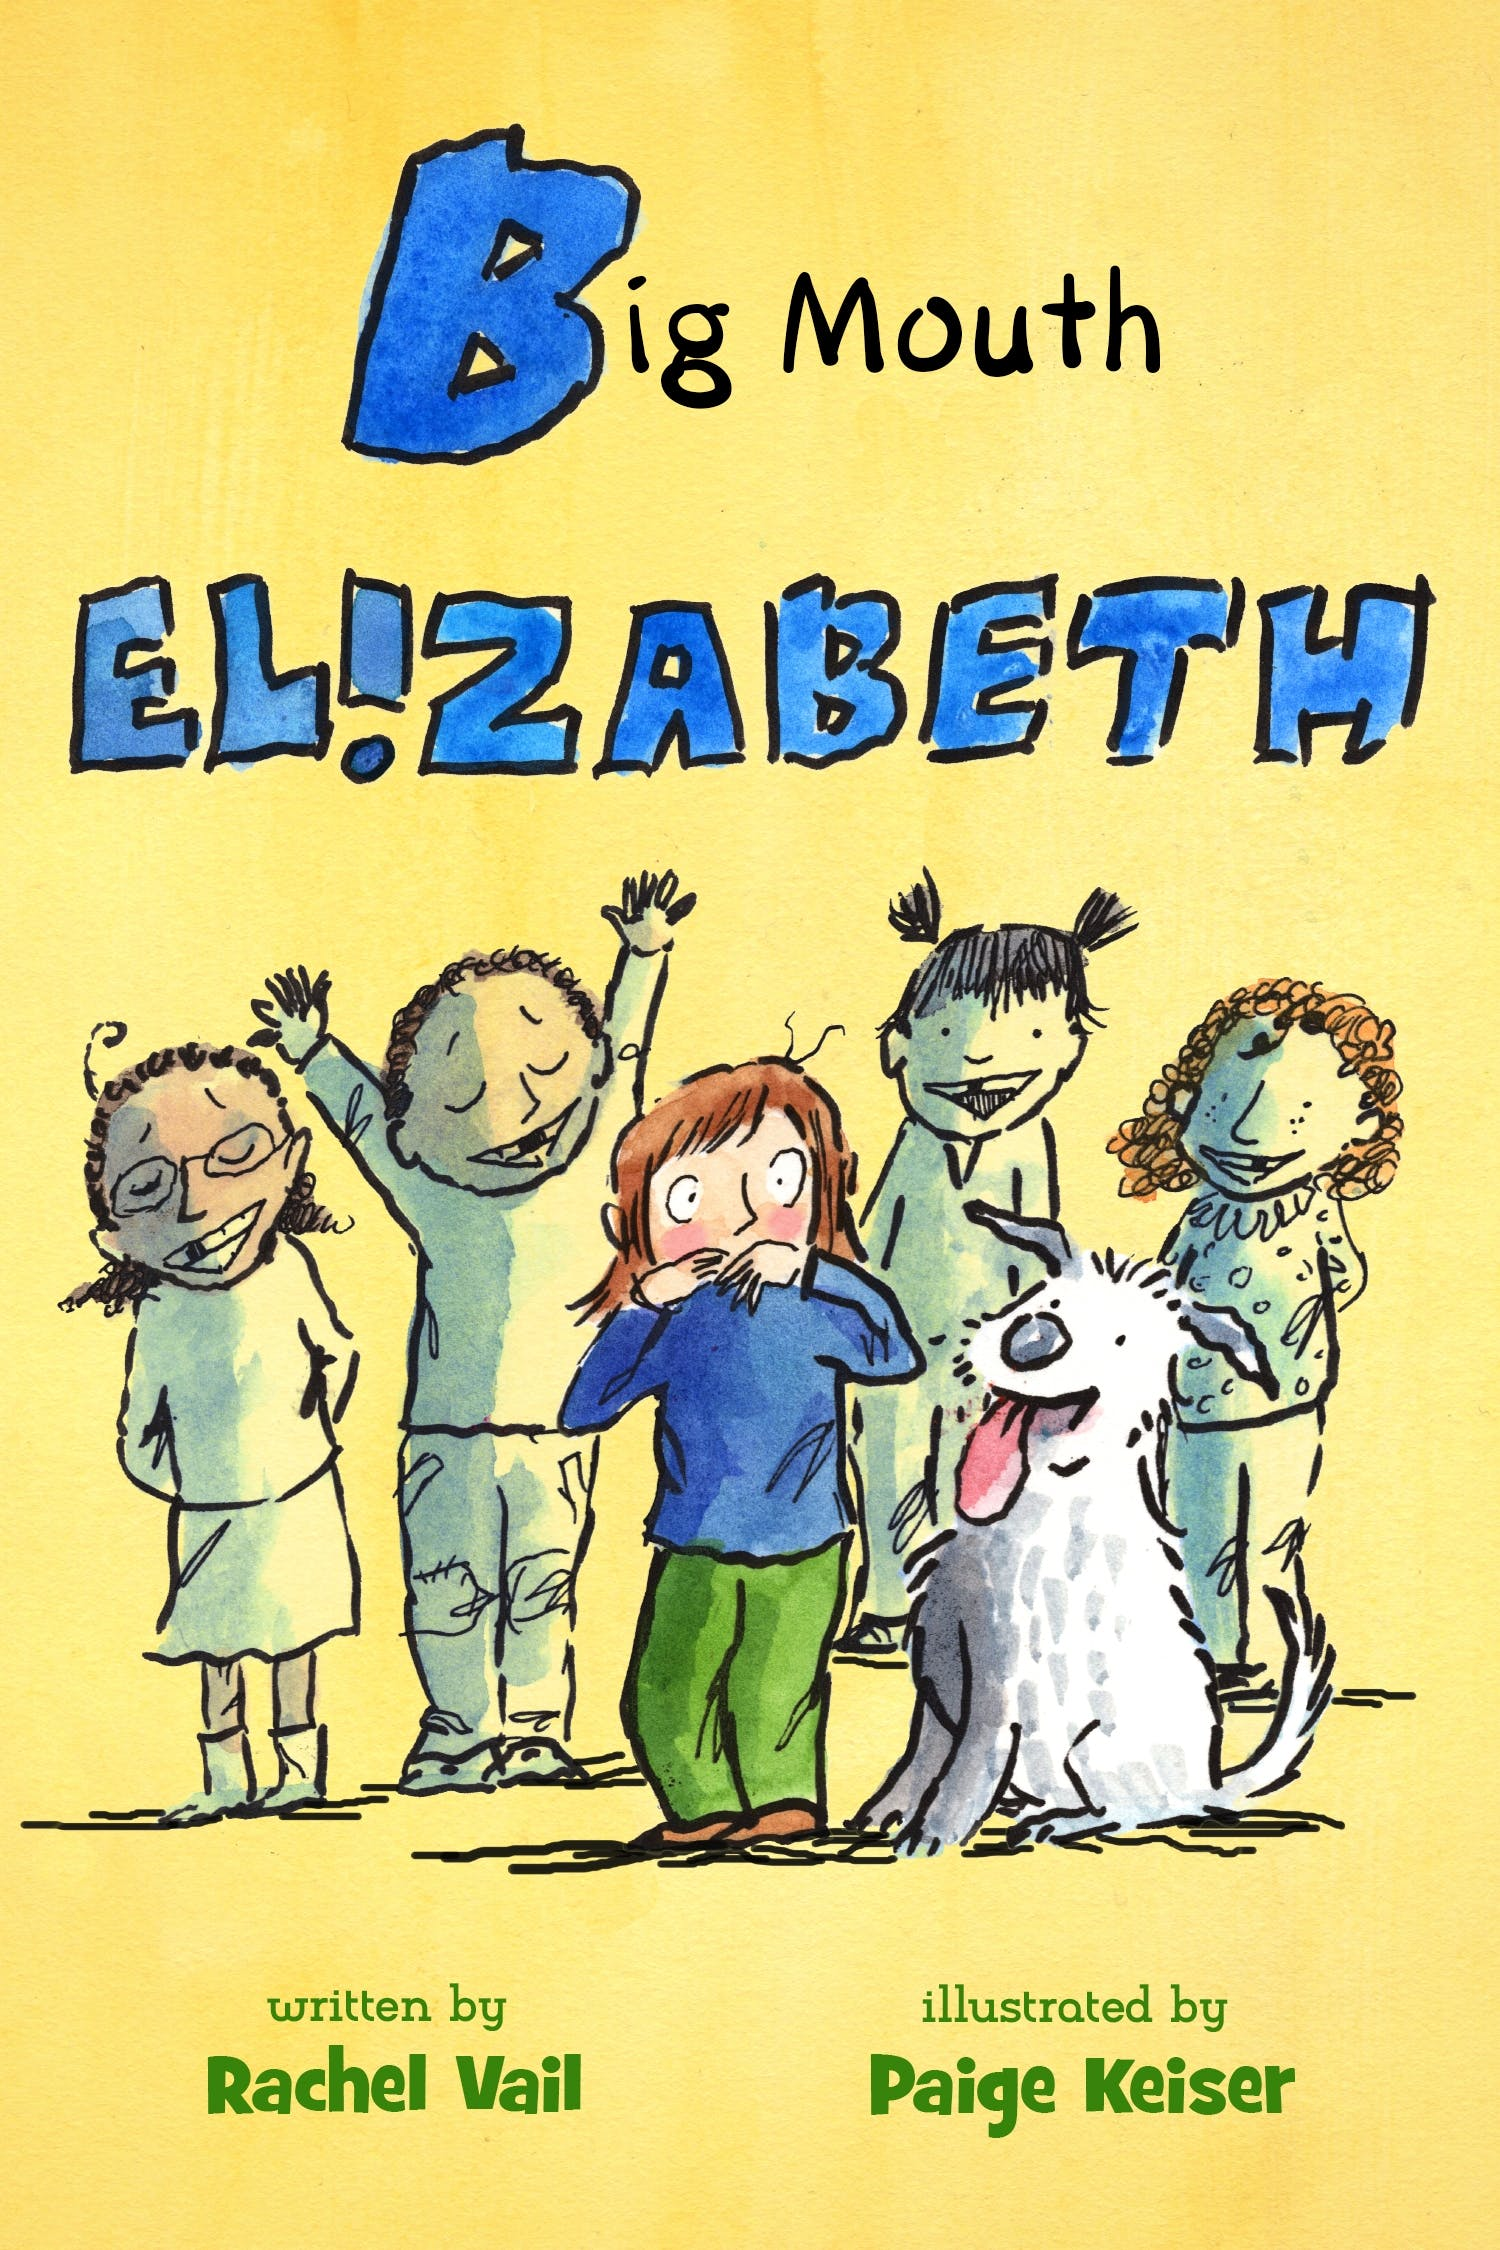 Image of Big Mouth Elizabeth